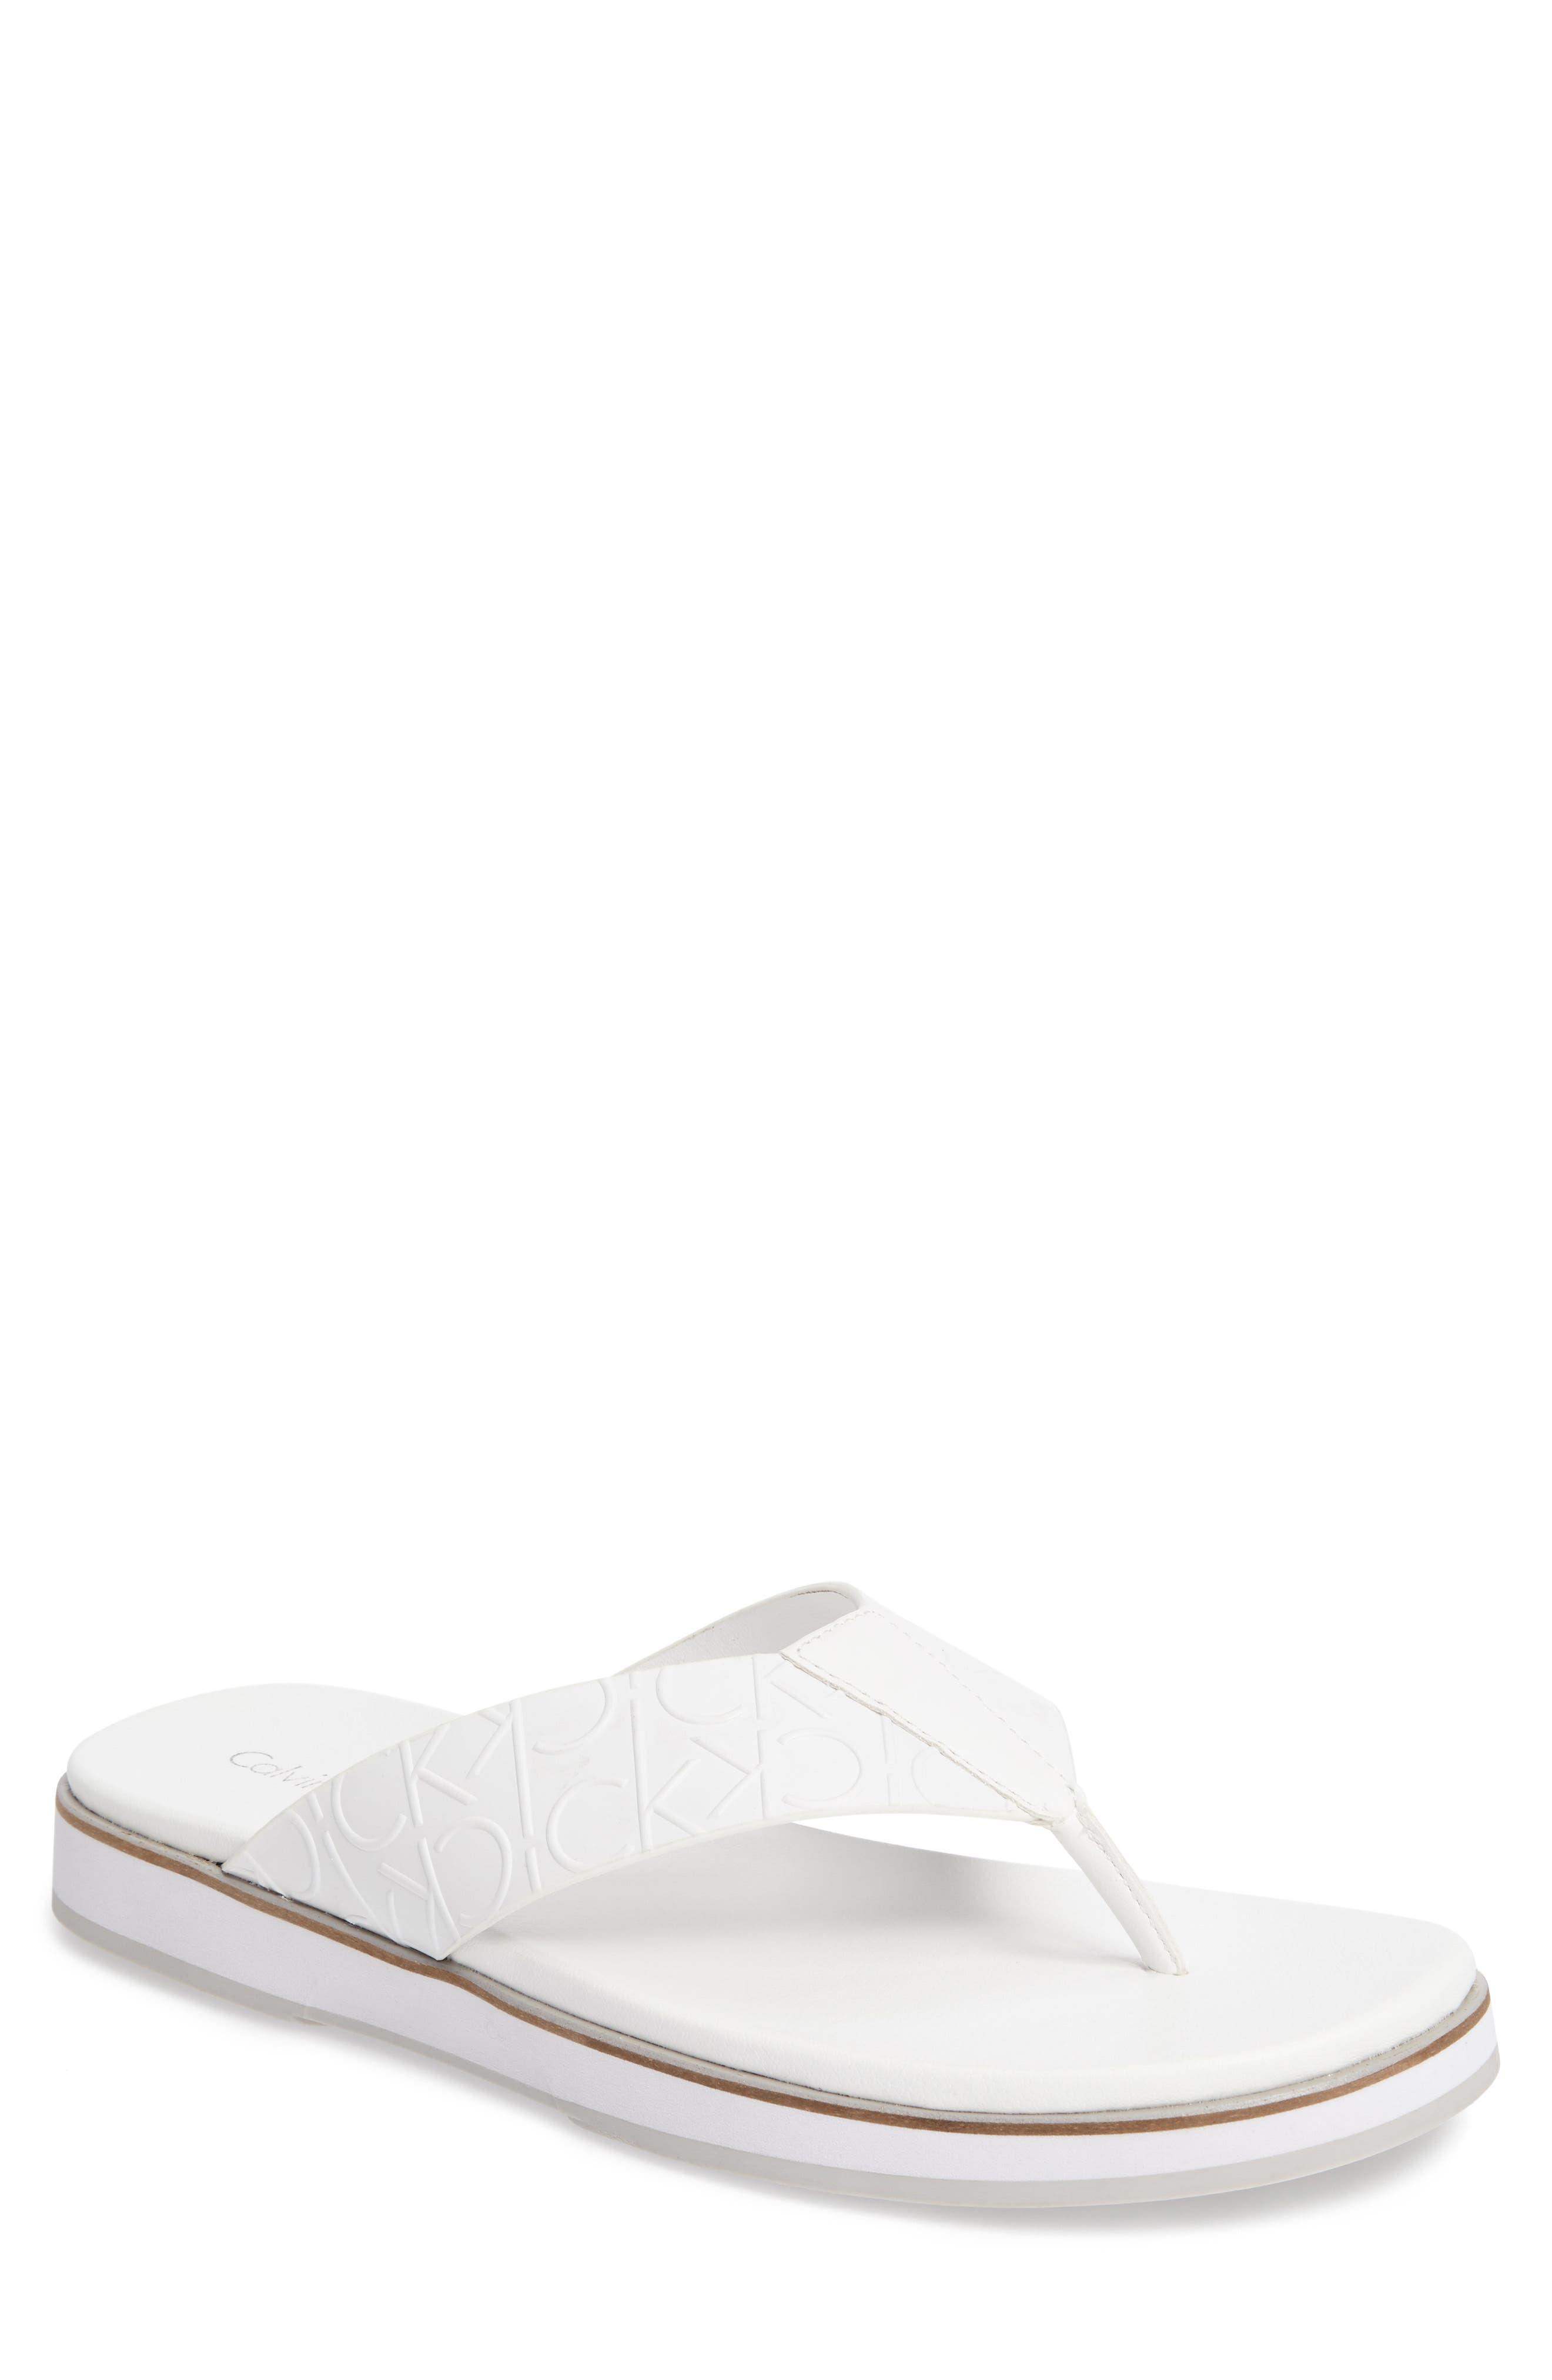 Calvin Klein Deano Flip Flop (Men)